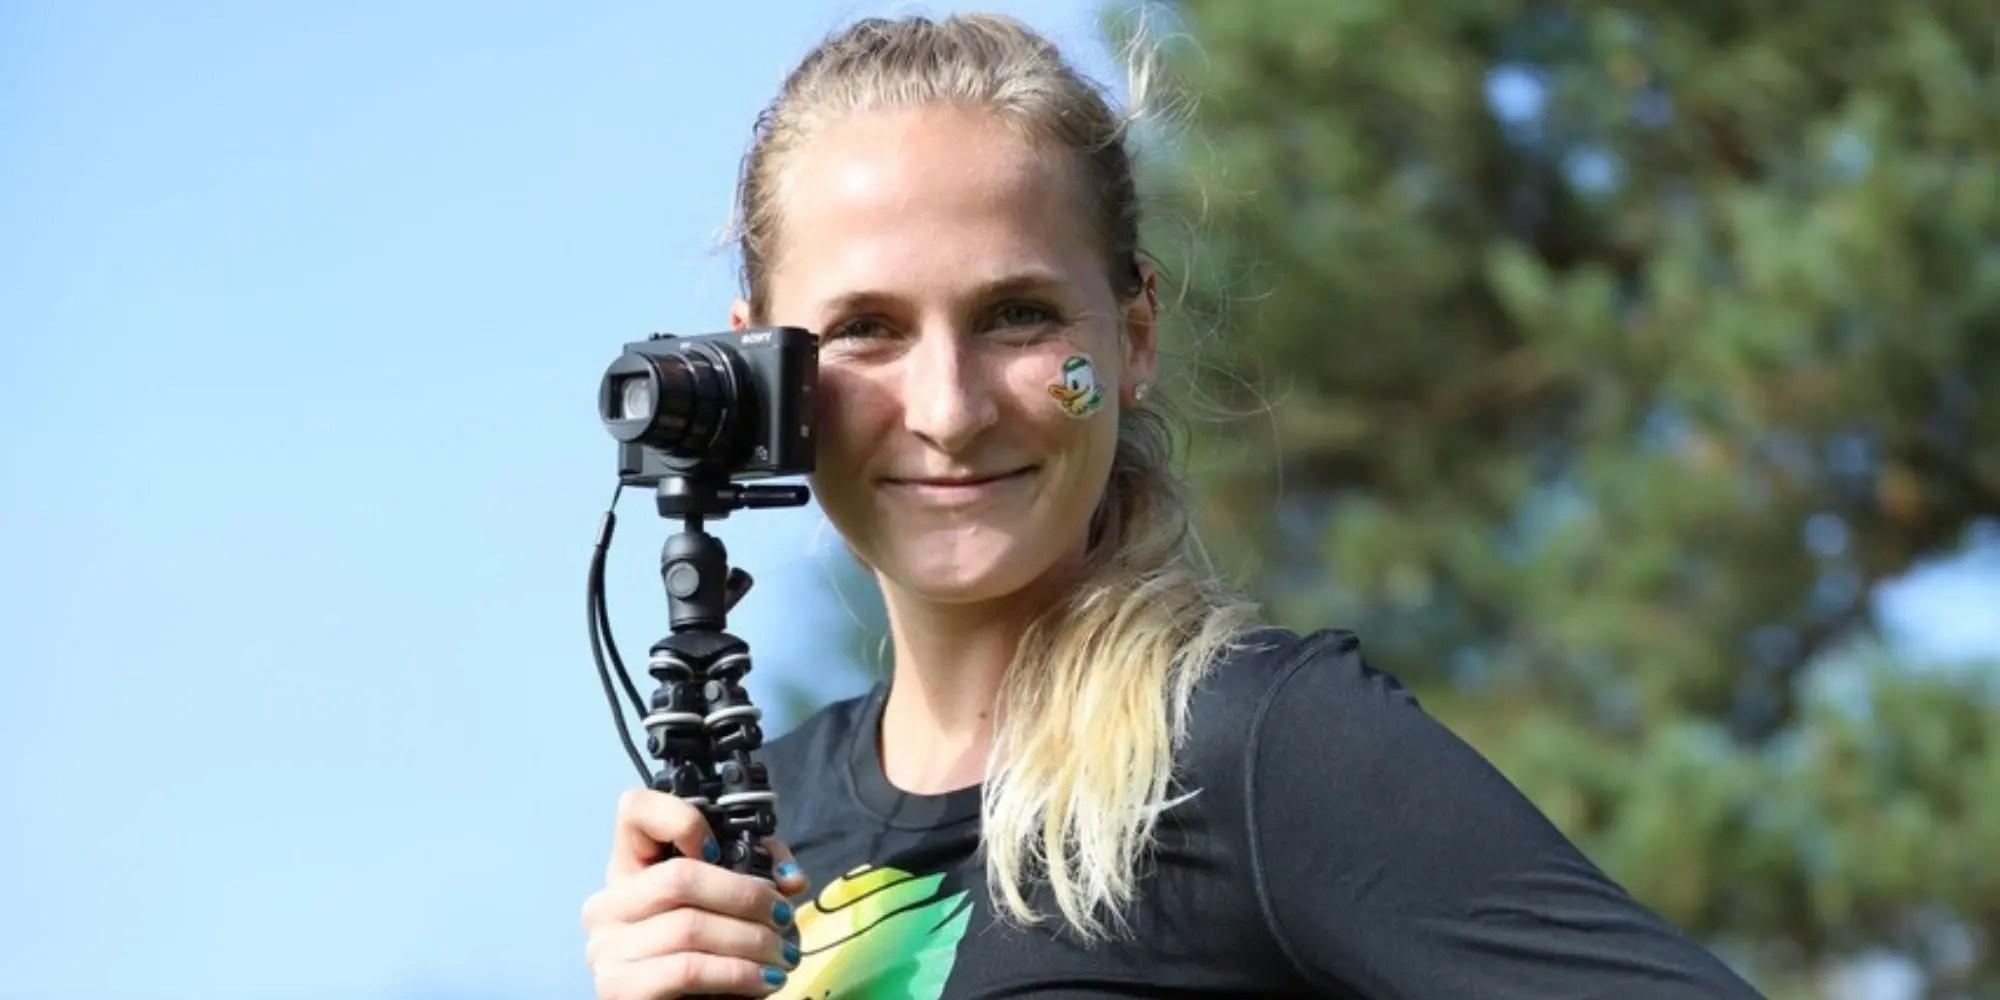 Emma Abrahamson